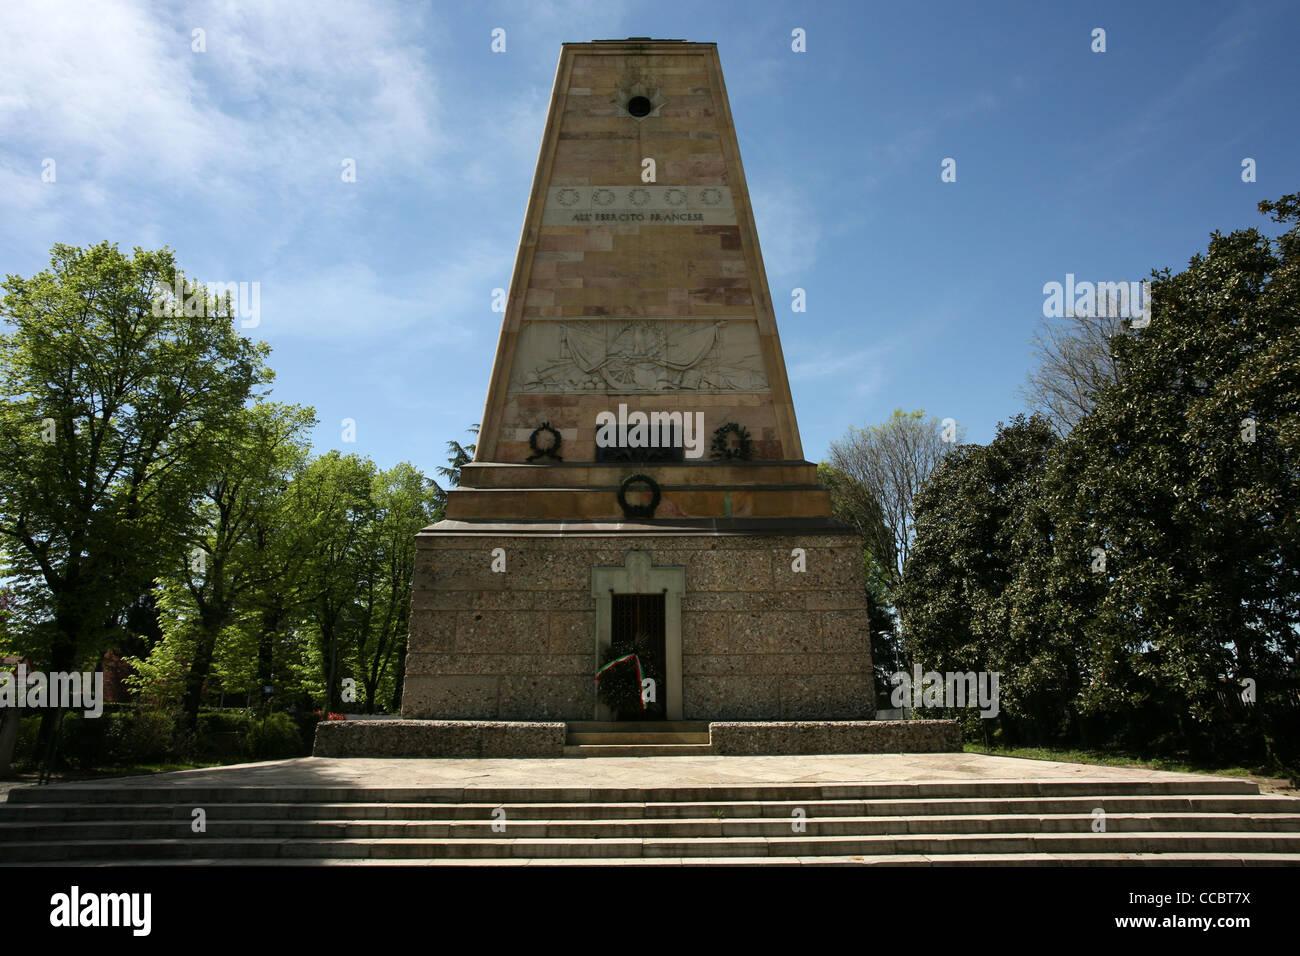 Magenta, Ossario caduti, statua gen. Mac Mahon, Lombardy, Italy, Europe - Stock Image